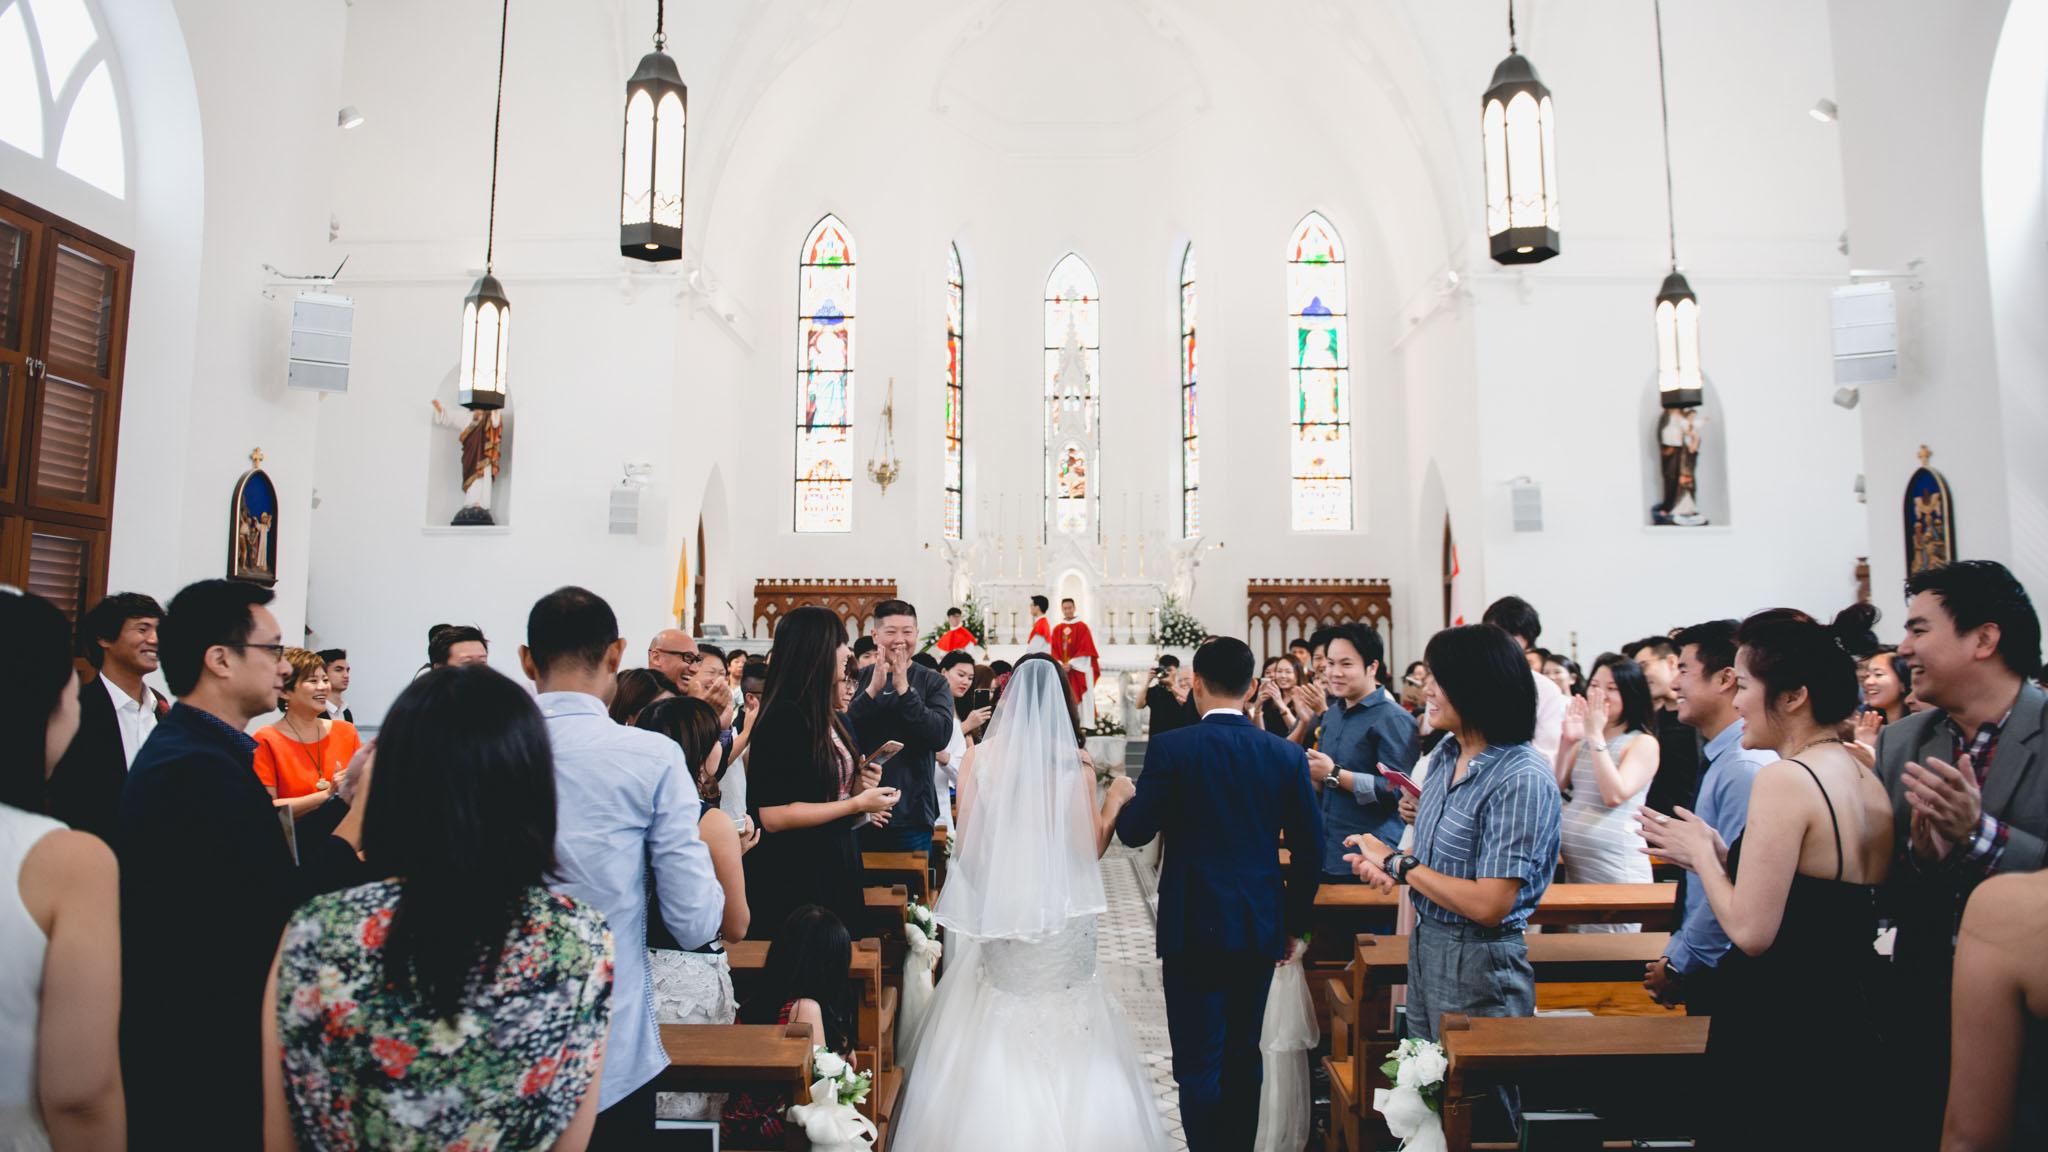 wedding church saints peter and paul 00048.JPG